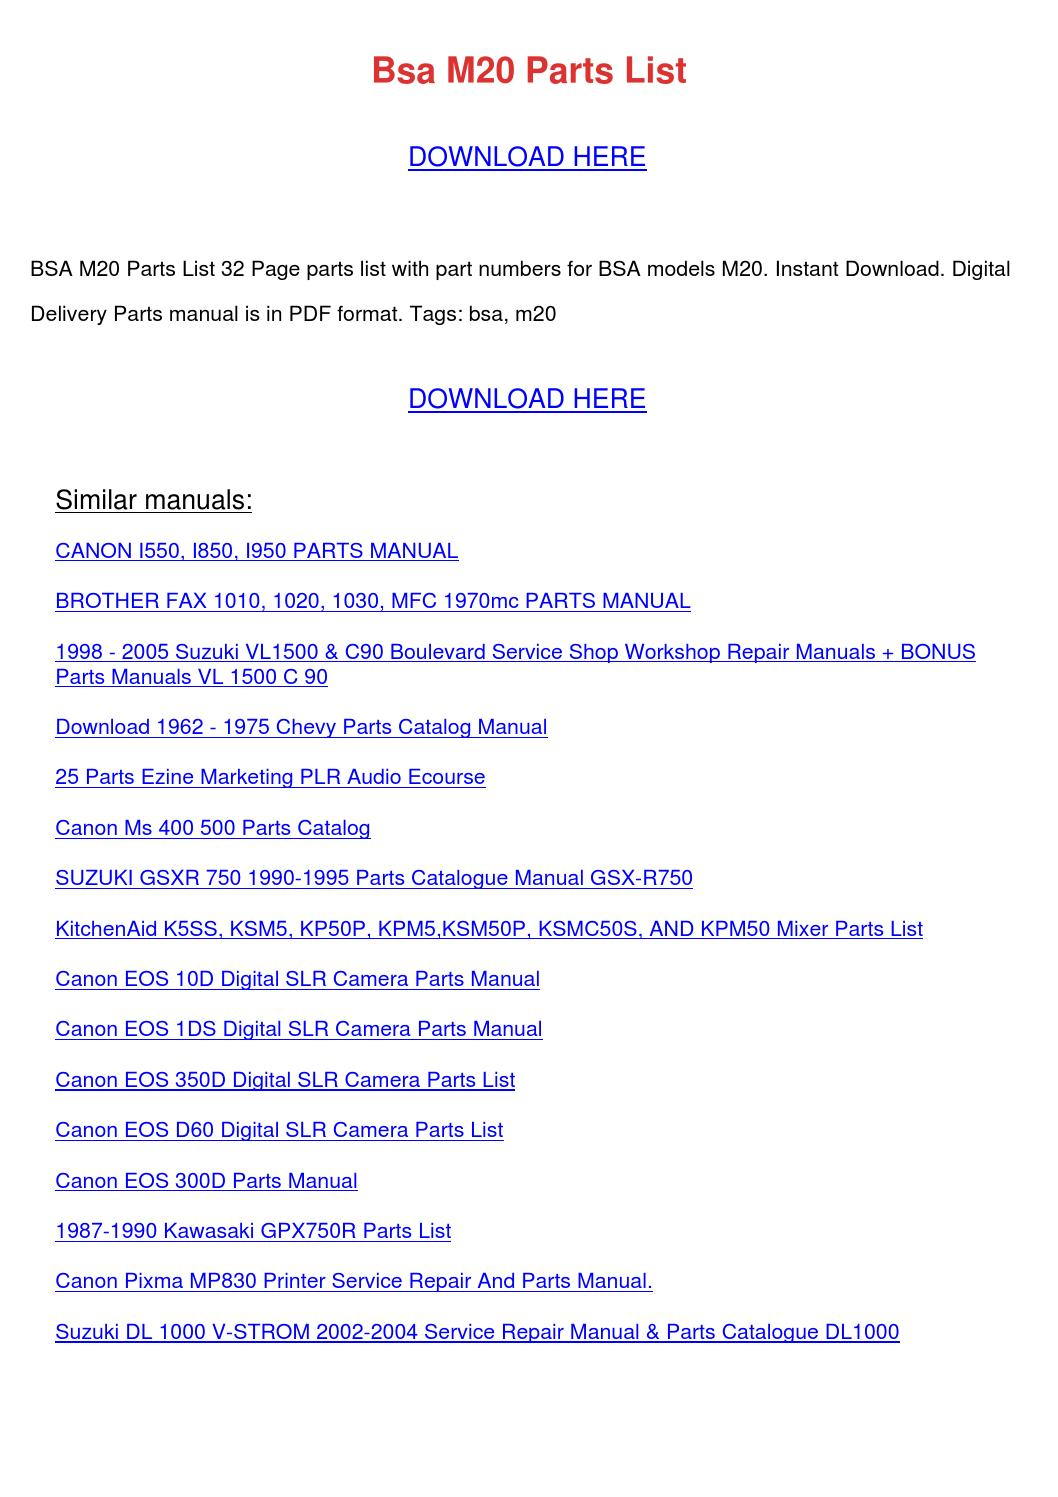 Bsa M20 Parts List By Eduardocromer